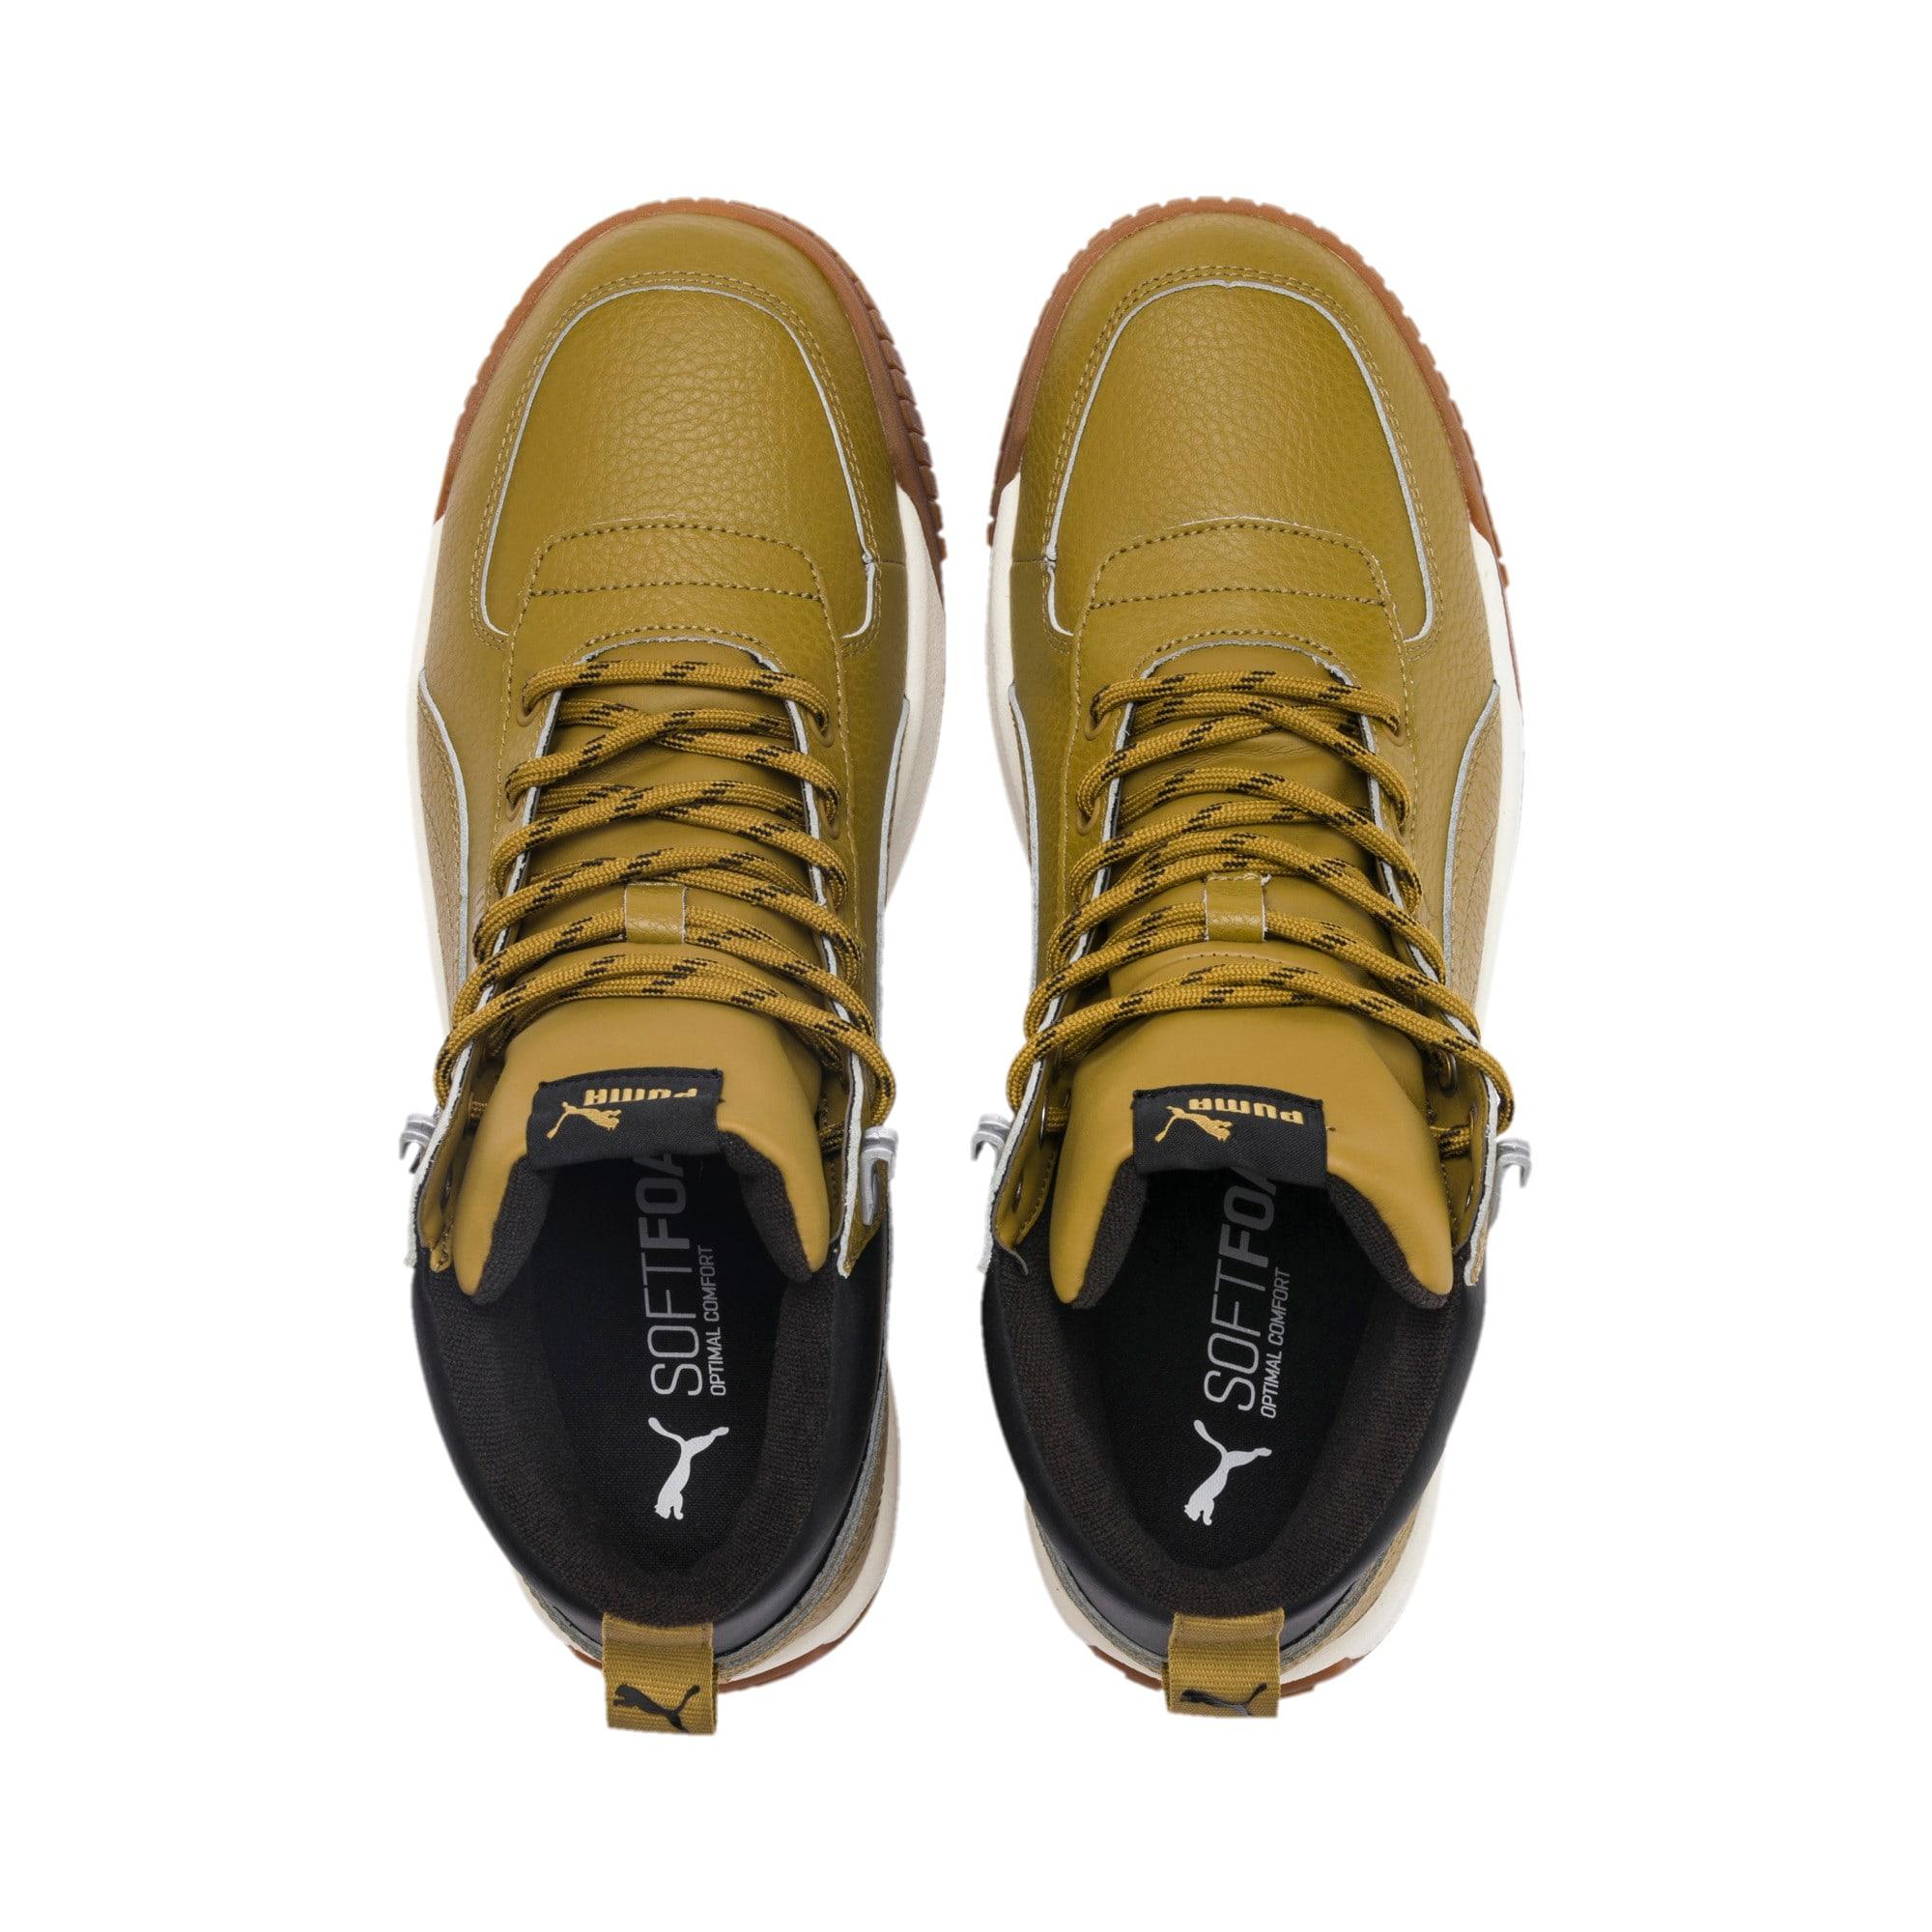 Thumbnail 7 of Tarrenz SB PURETEX Mid Sneakers, Moss Green-Puma Black, medium